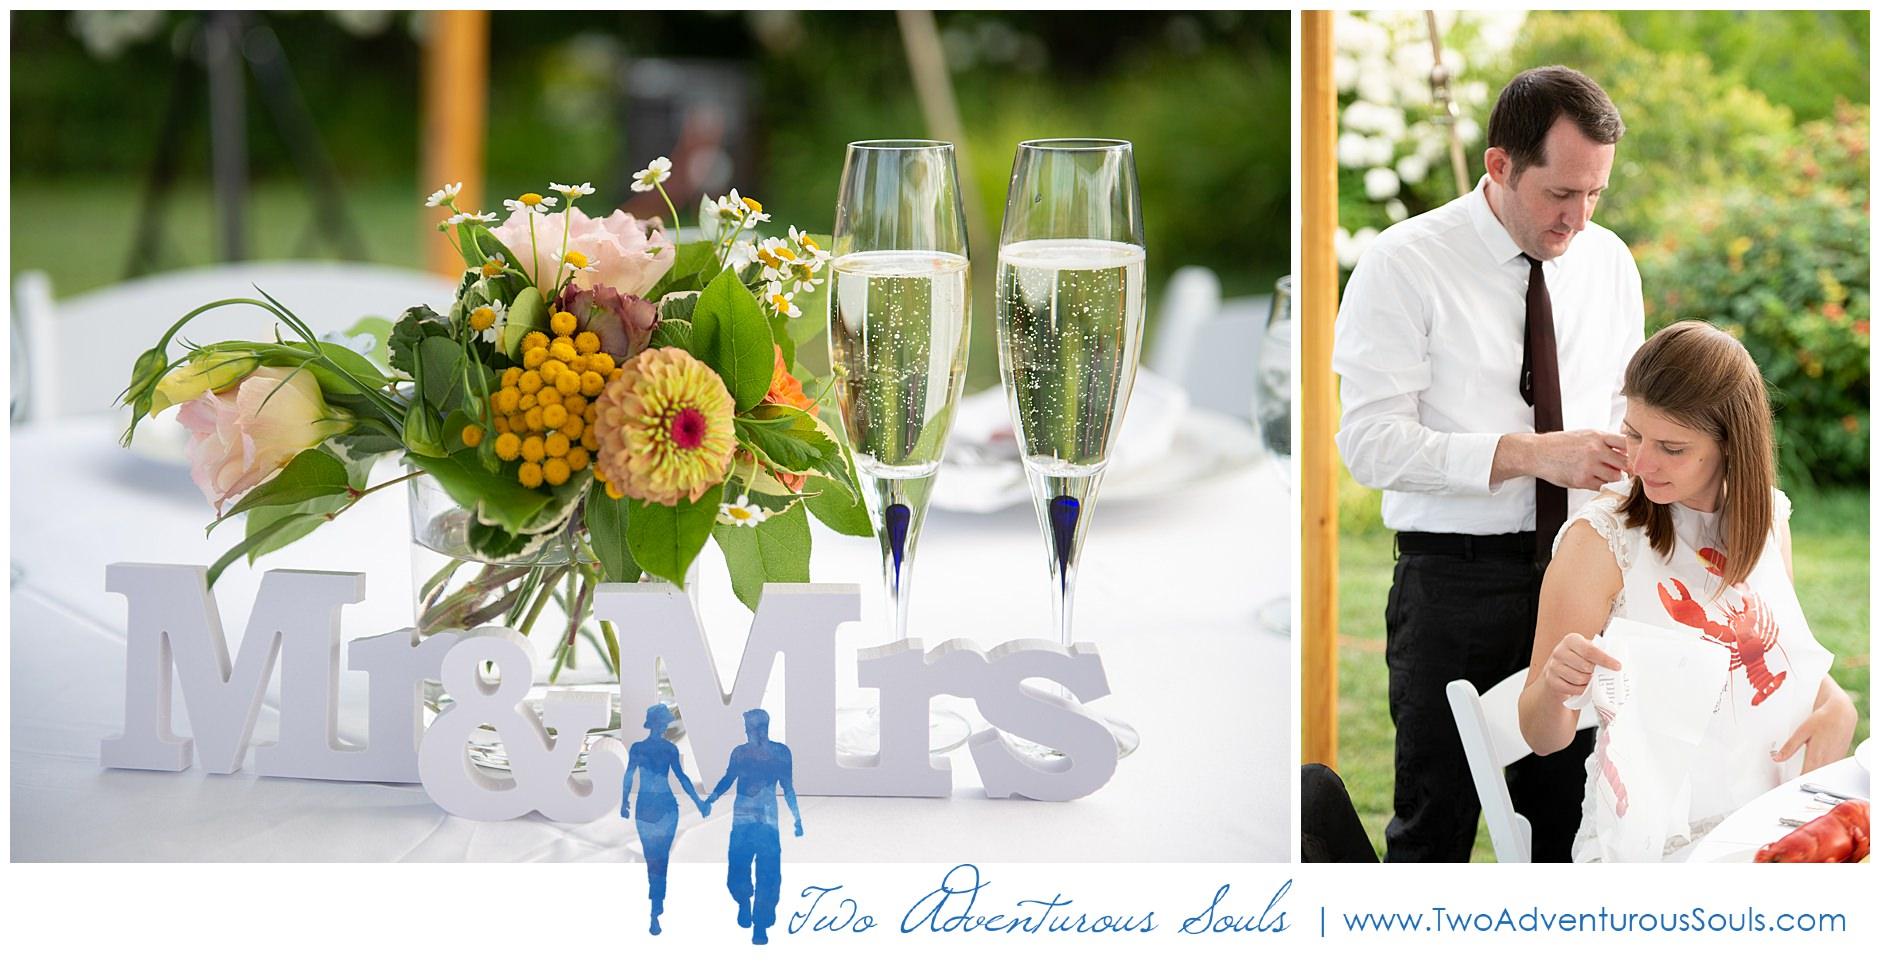 Chebeague Island Inn Wedding Photograpehrs, Maine Wedding Photographers, Two Adventurous Souls-082419_0012.jpg